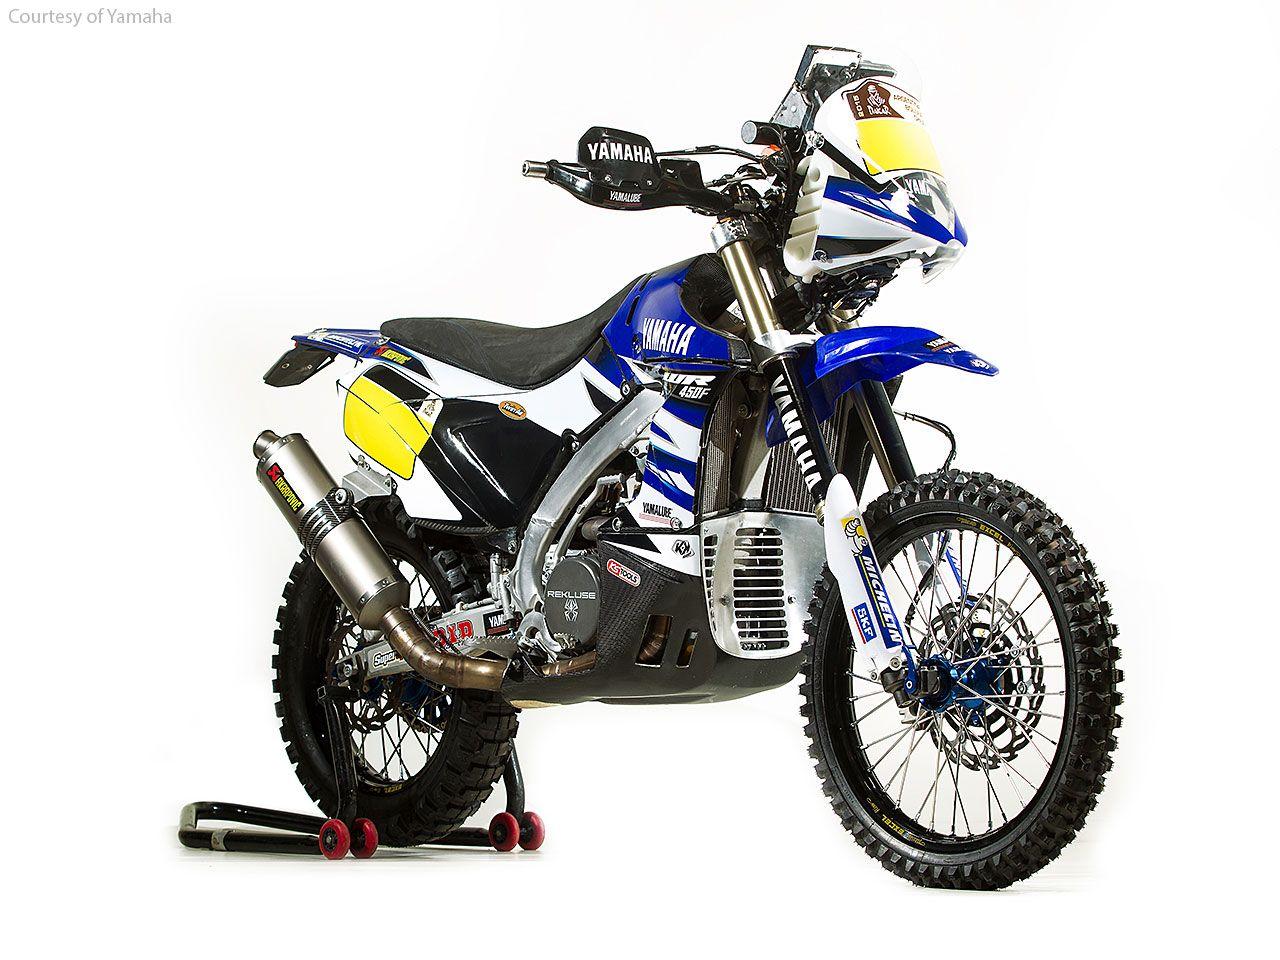 Yamaha WR450F Rally Updated for Dakar 2015 Motorcycle